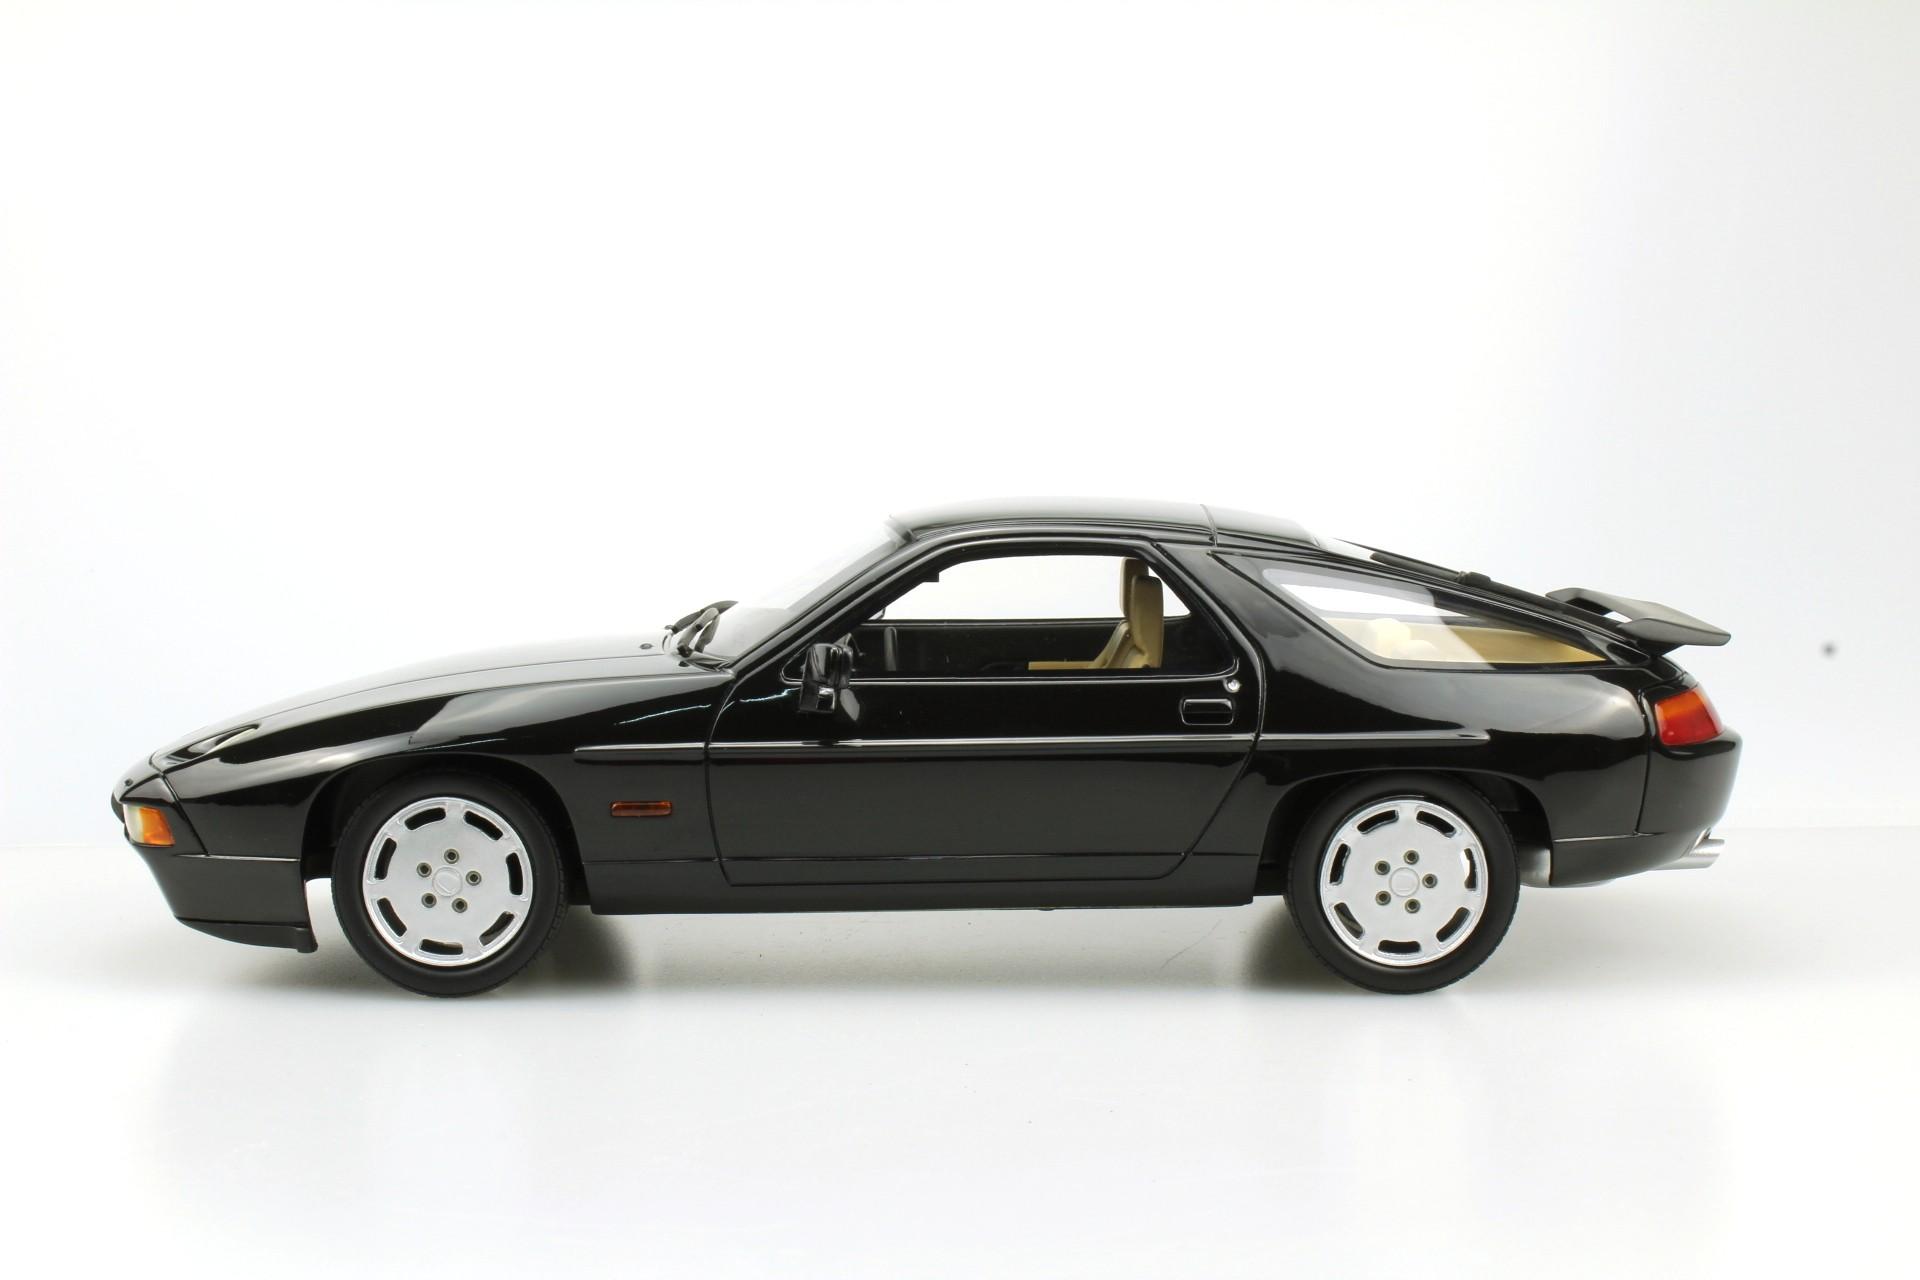 LS Collectibles Porsche 928 S4 118 Black LS022B